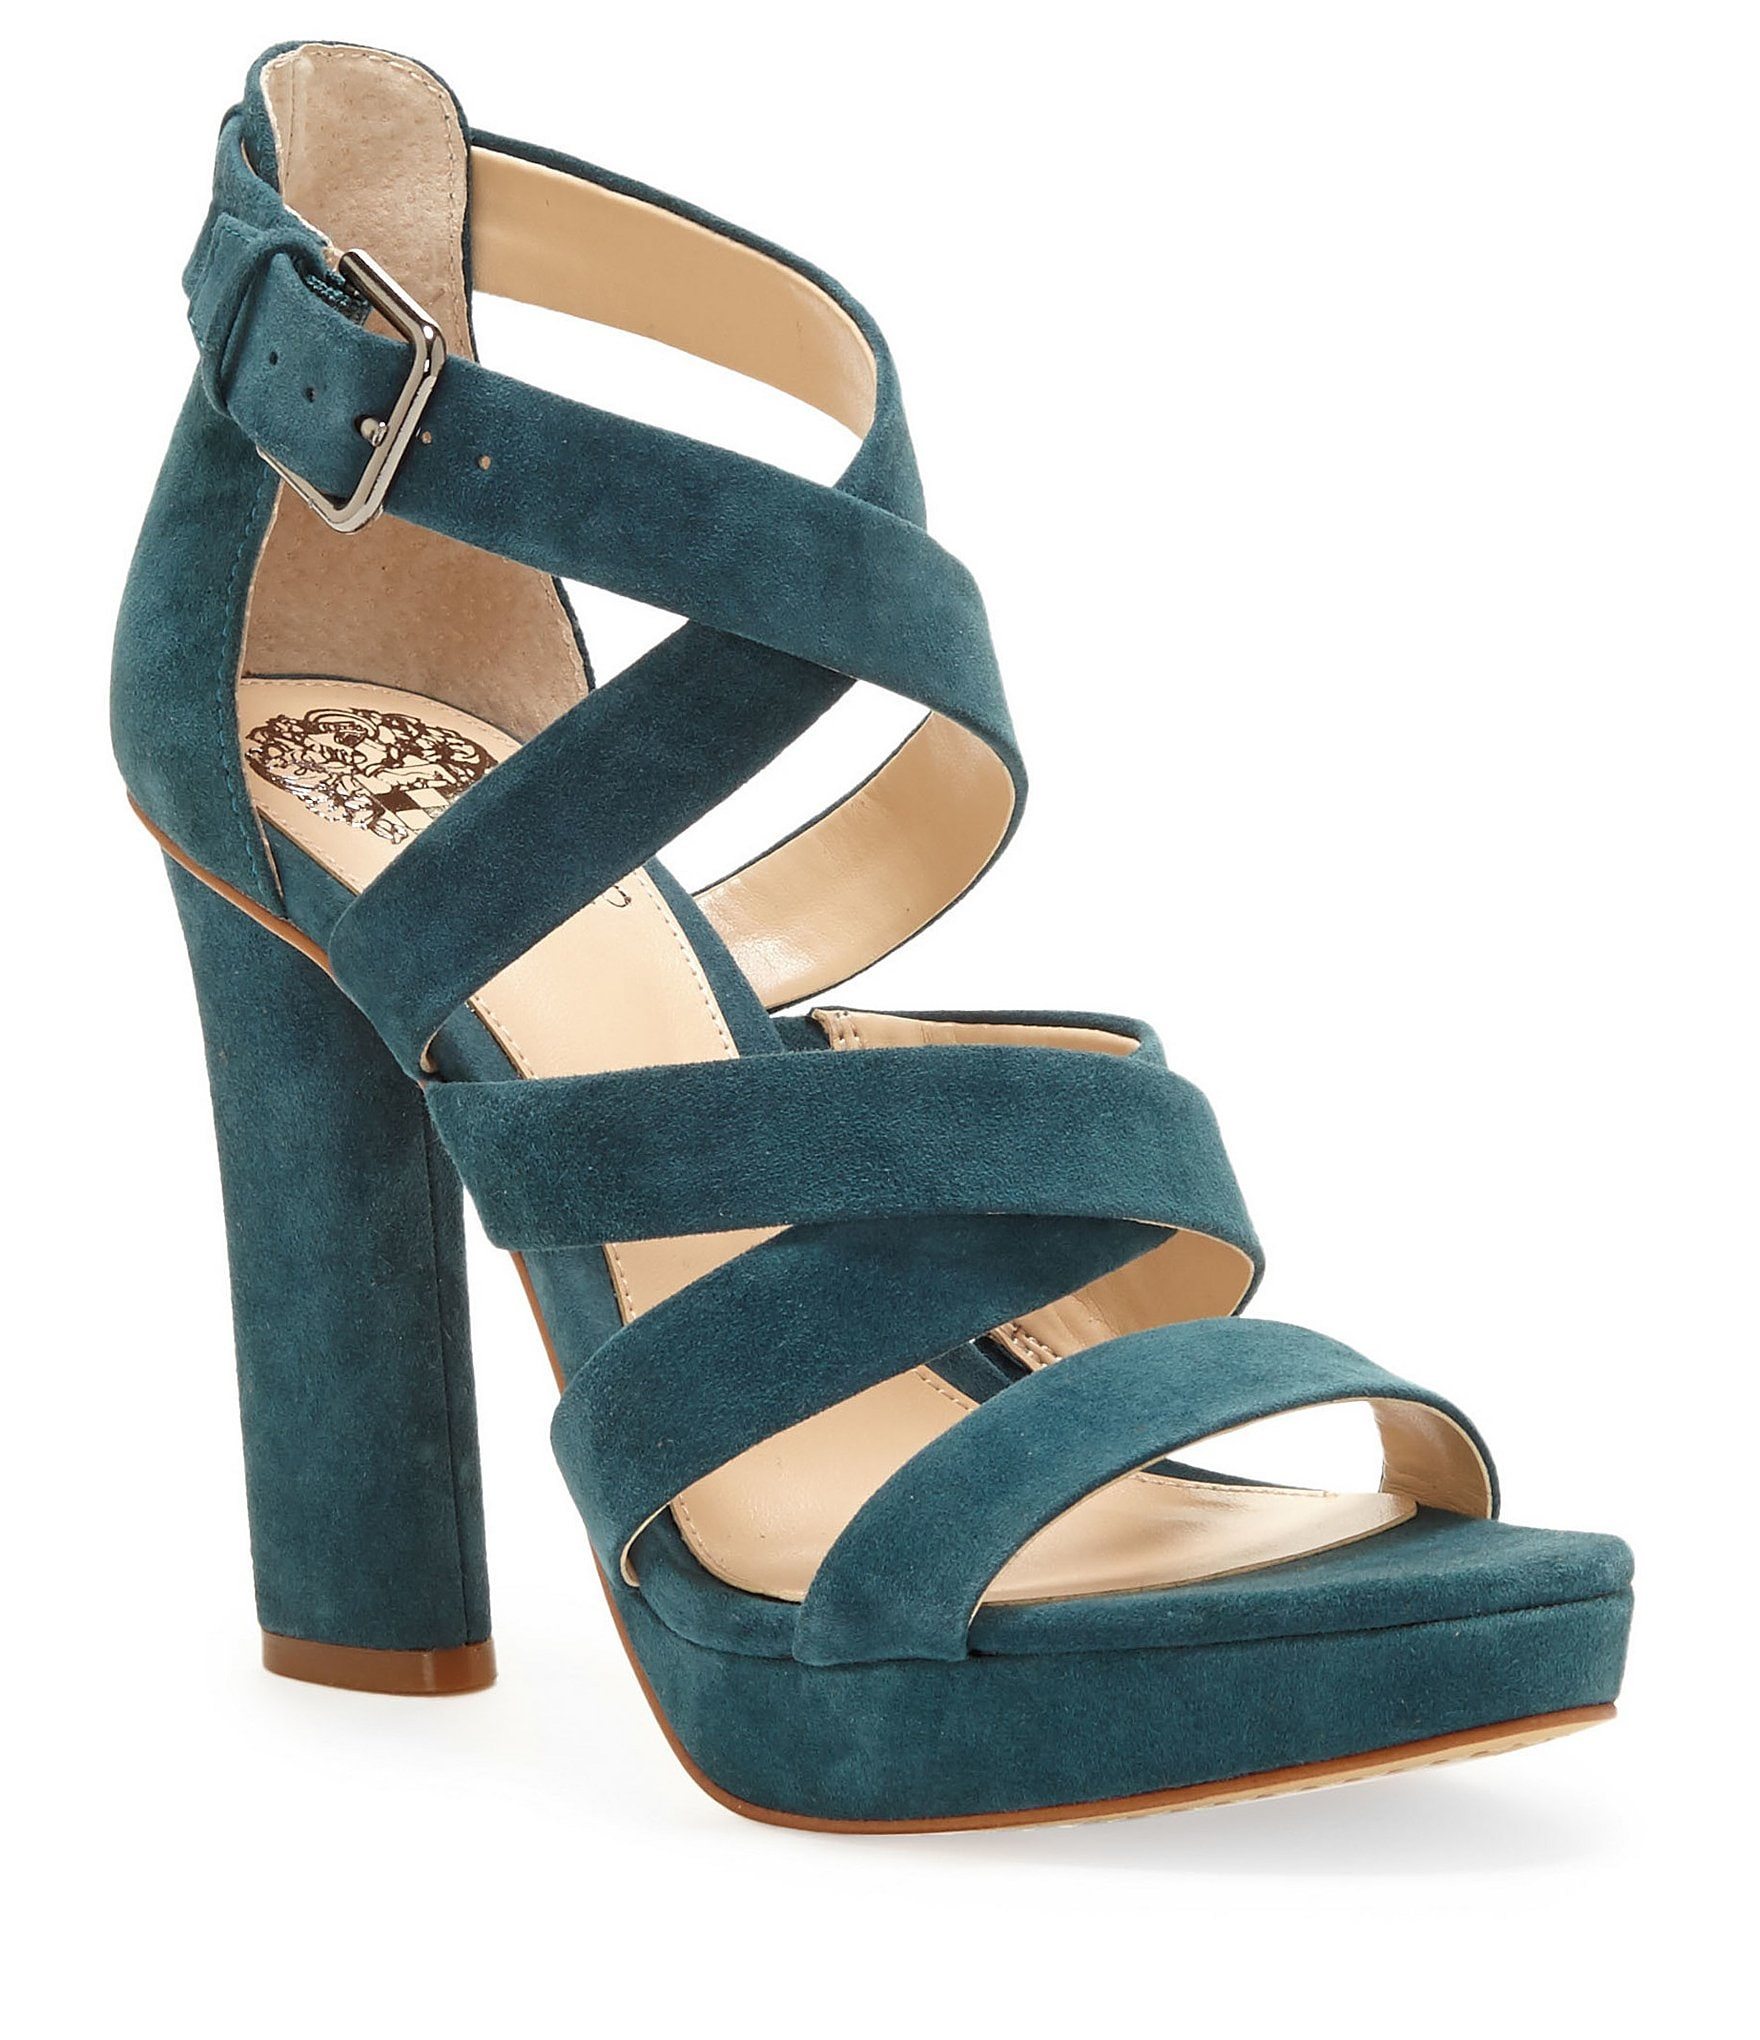 vince camuto catyna suede platform dress sandals dillards